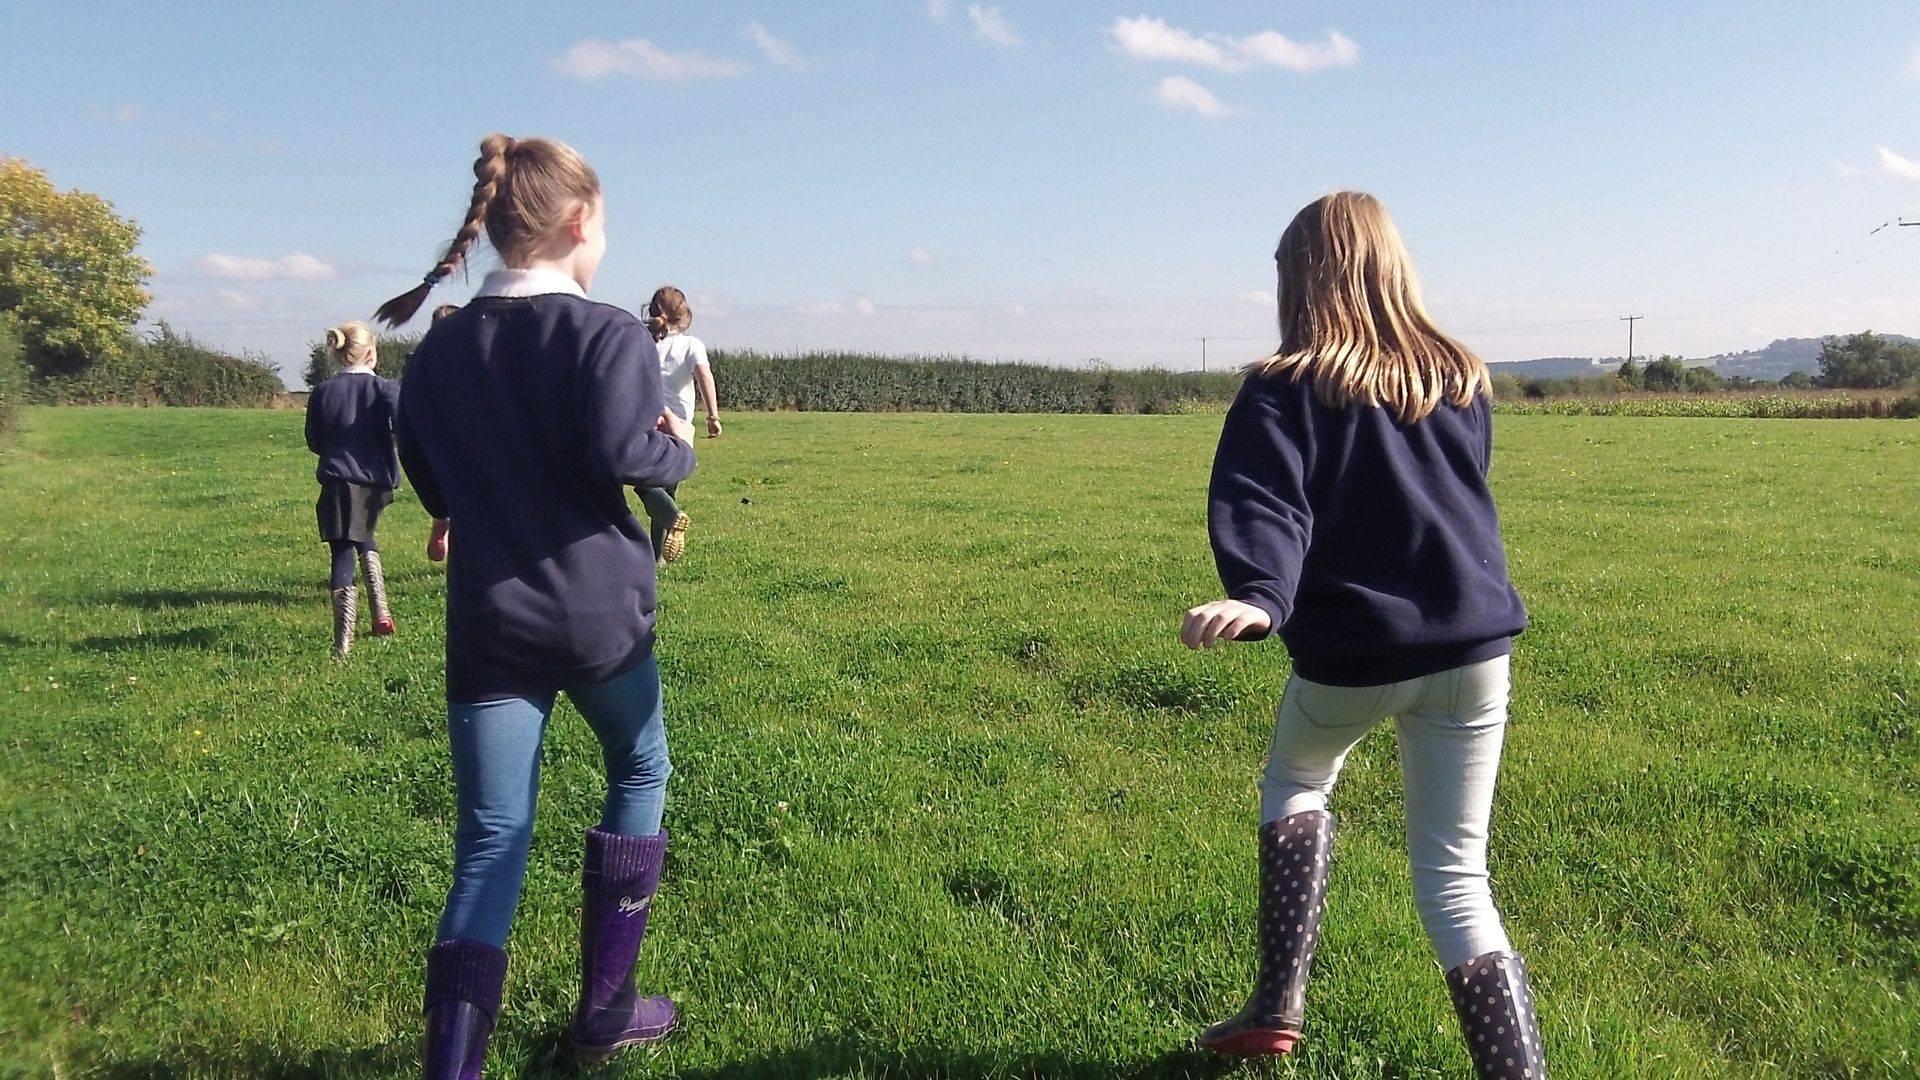 Hereford Community Farm visit from Stretton Sugwas Academy